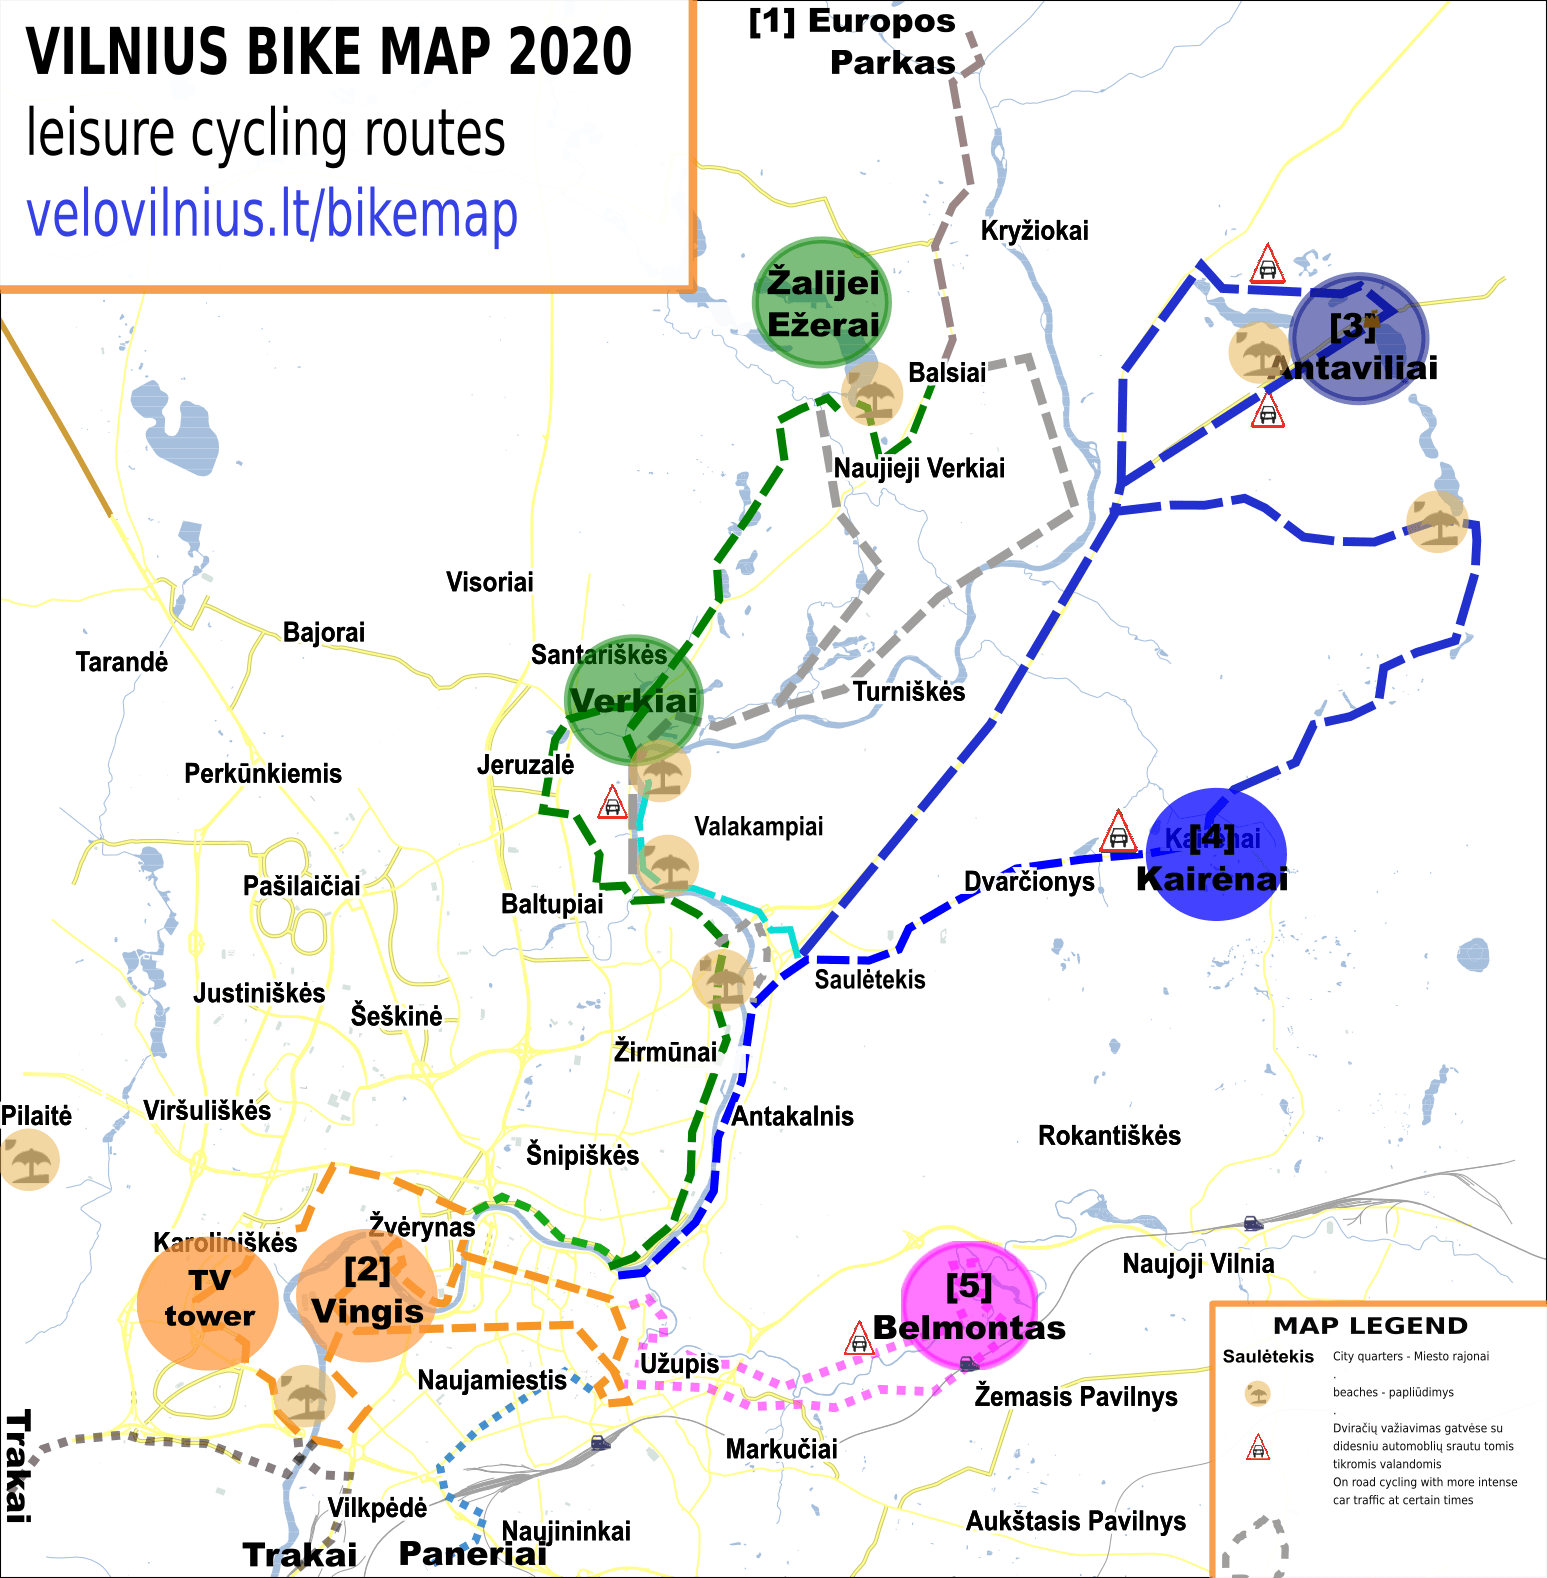 Vilnius Bike Map 2020 - overview